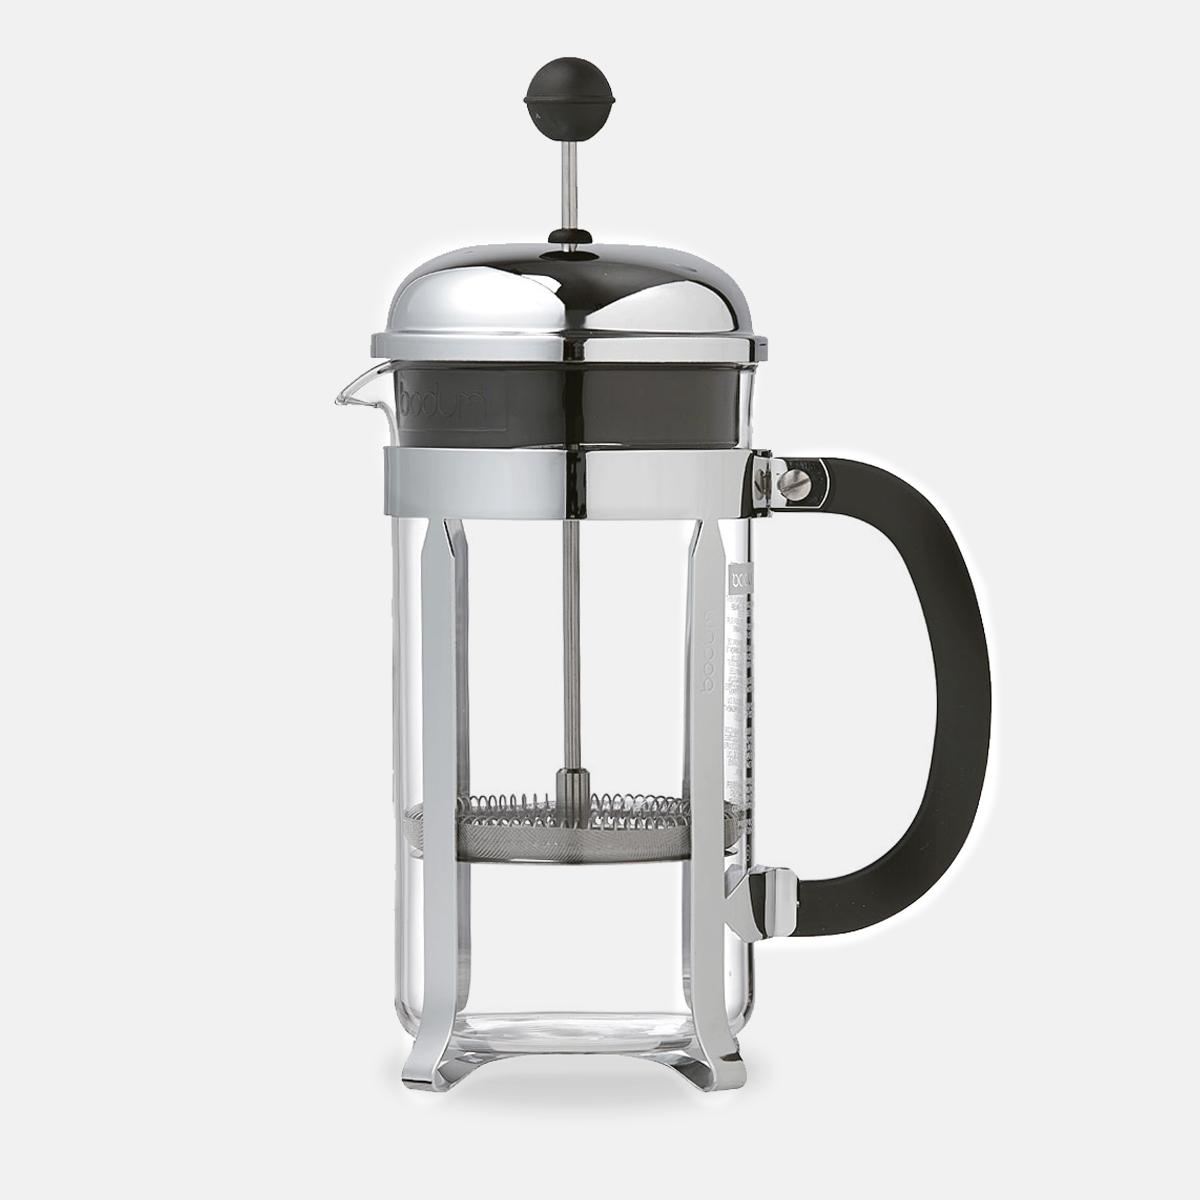 bodum 39 chambord 39 van dyck kaffee online shop online kaufen. Black Bedroom Furniture Sets. Home Design Ideas